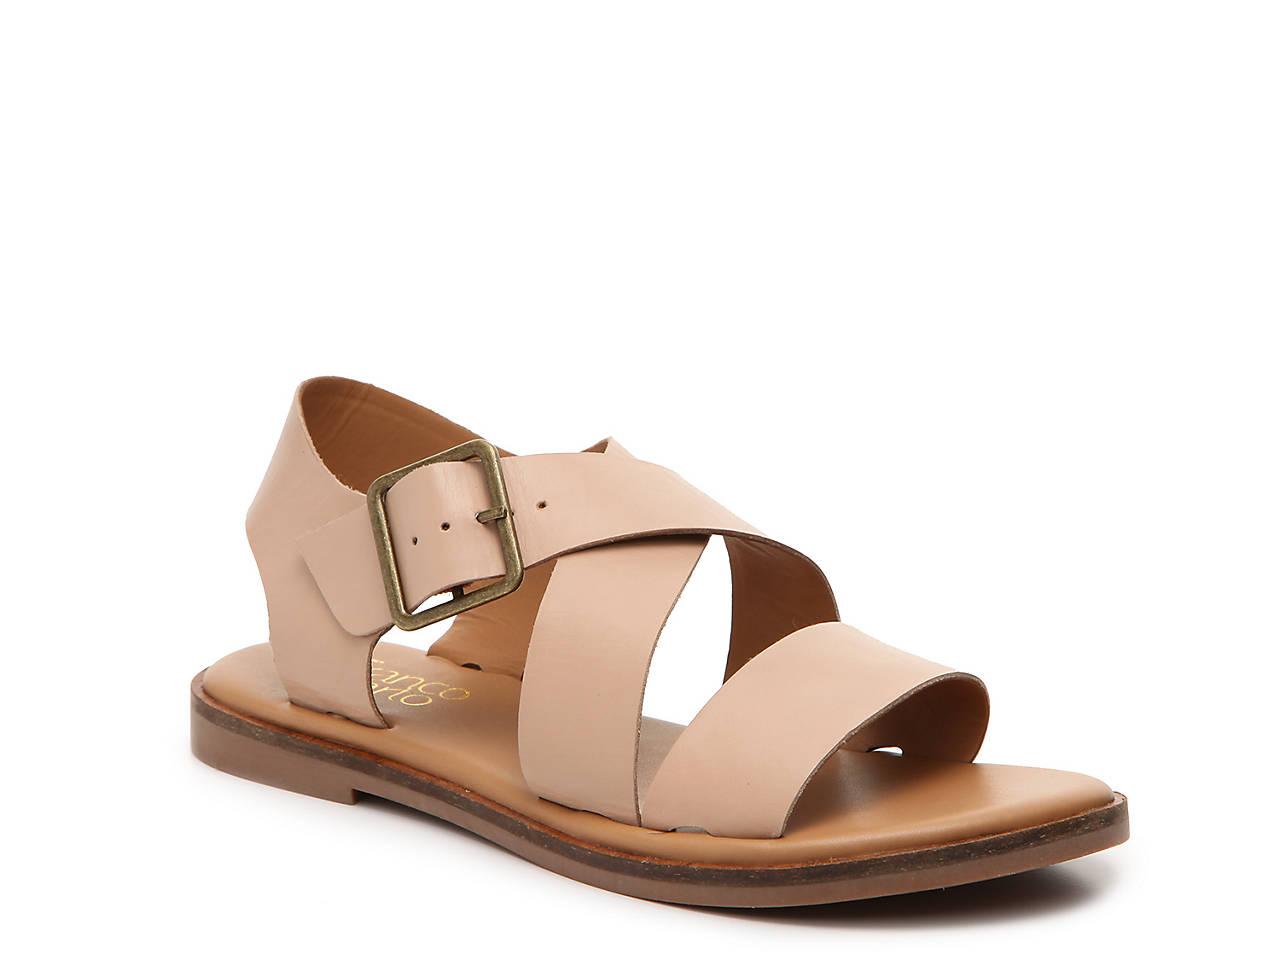 Franco Sarto Kara Leather Buckle Sandal zBxZ6TH7